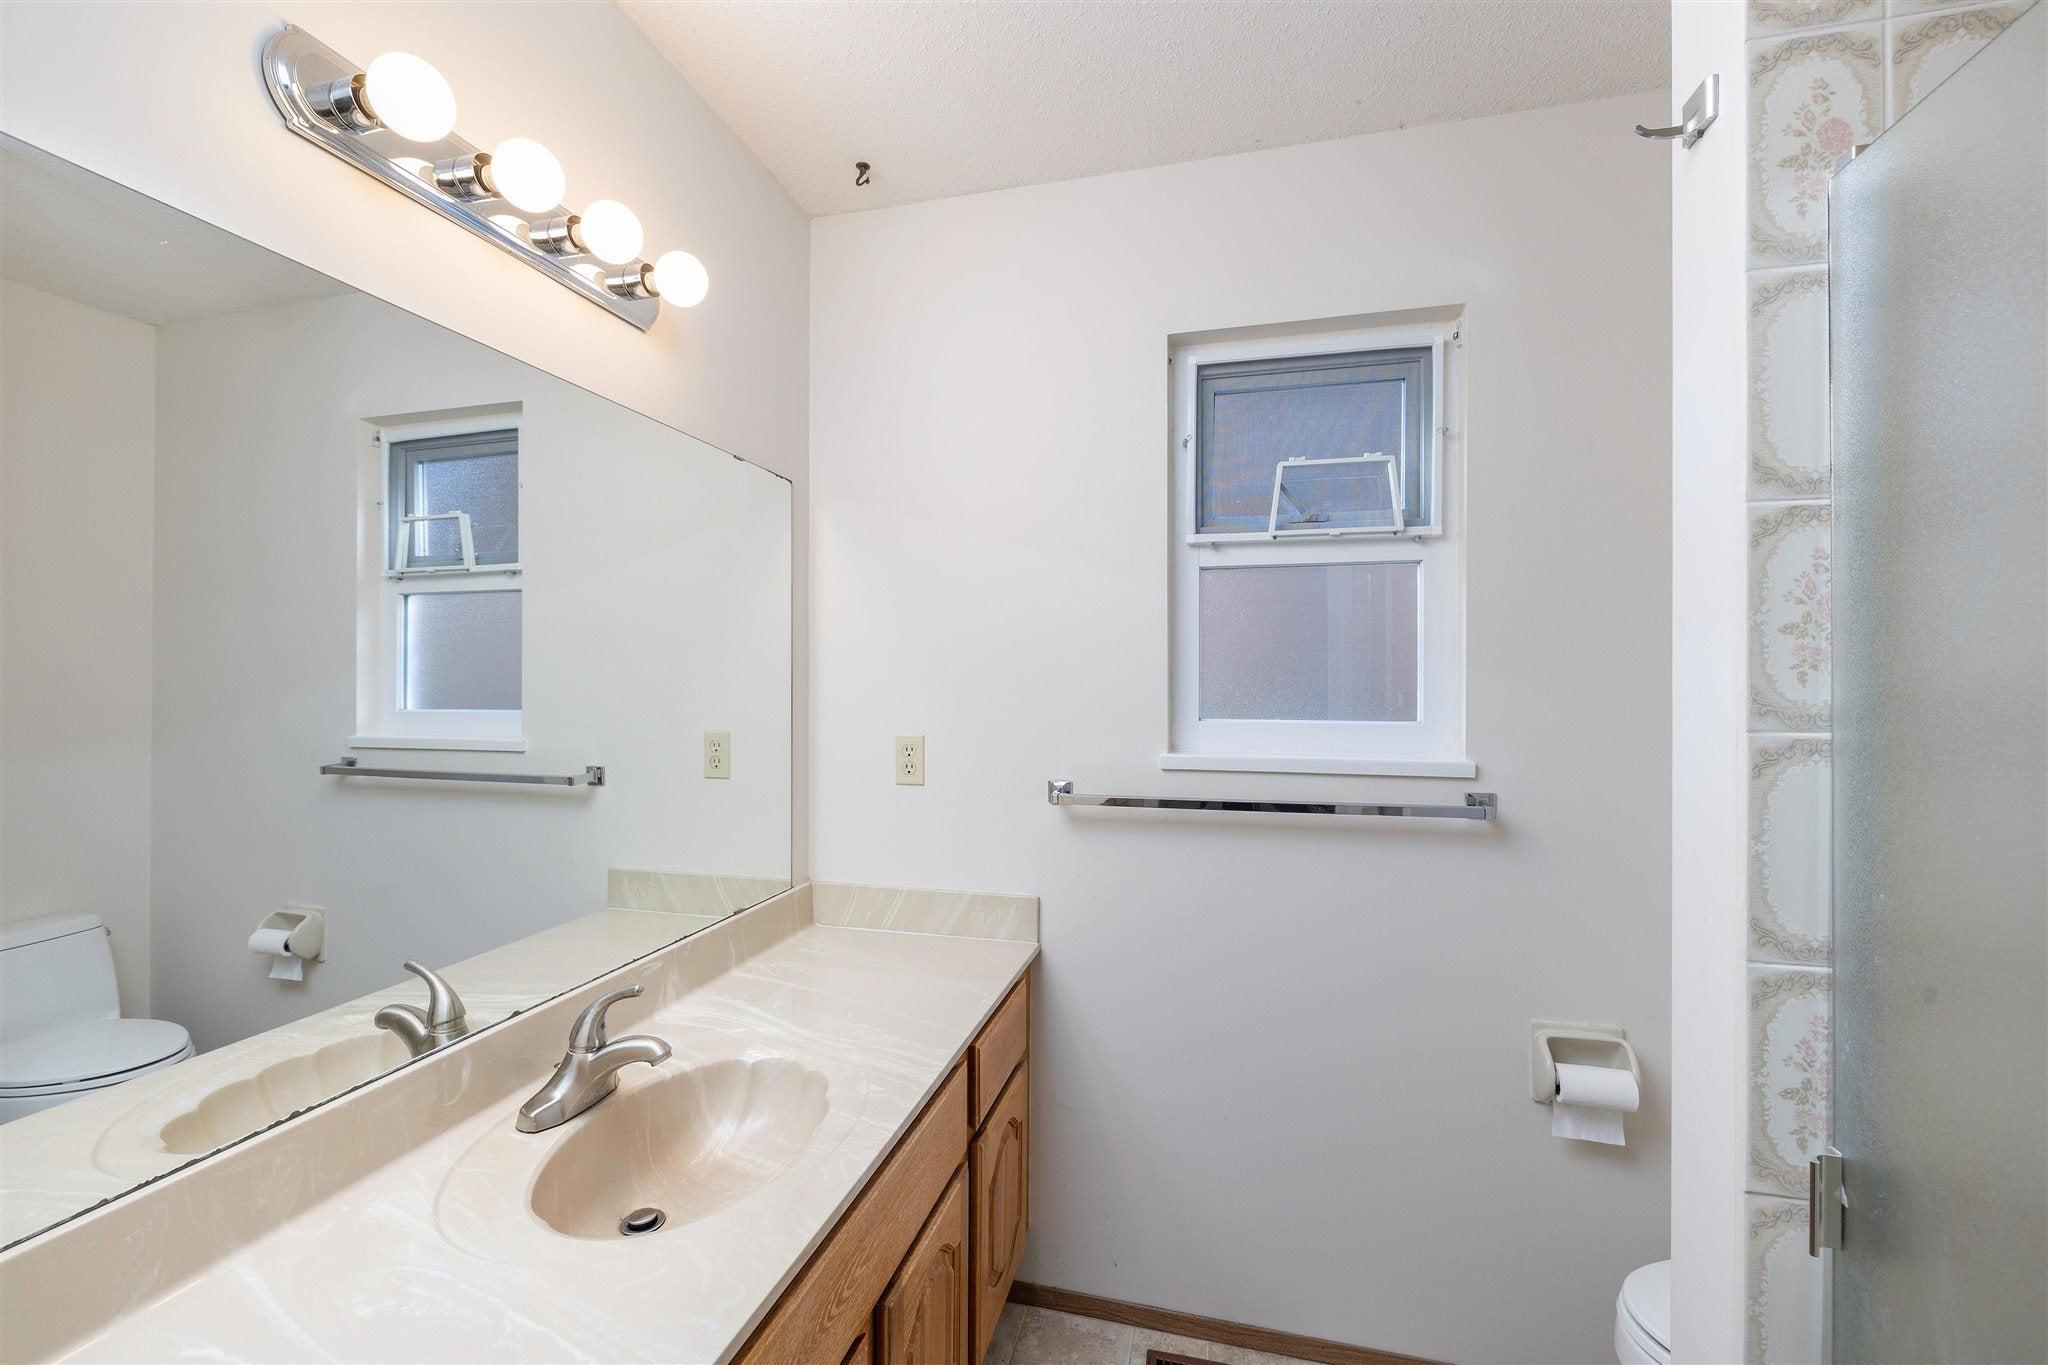 1743 148A STREET - Sunnyside Park Surrey House/Single Family for sale, 3 Bedrooms (R2604804) - #16